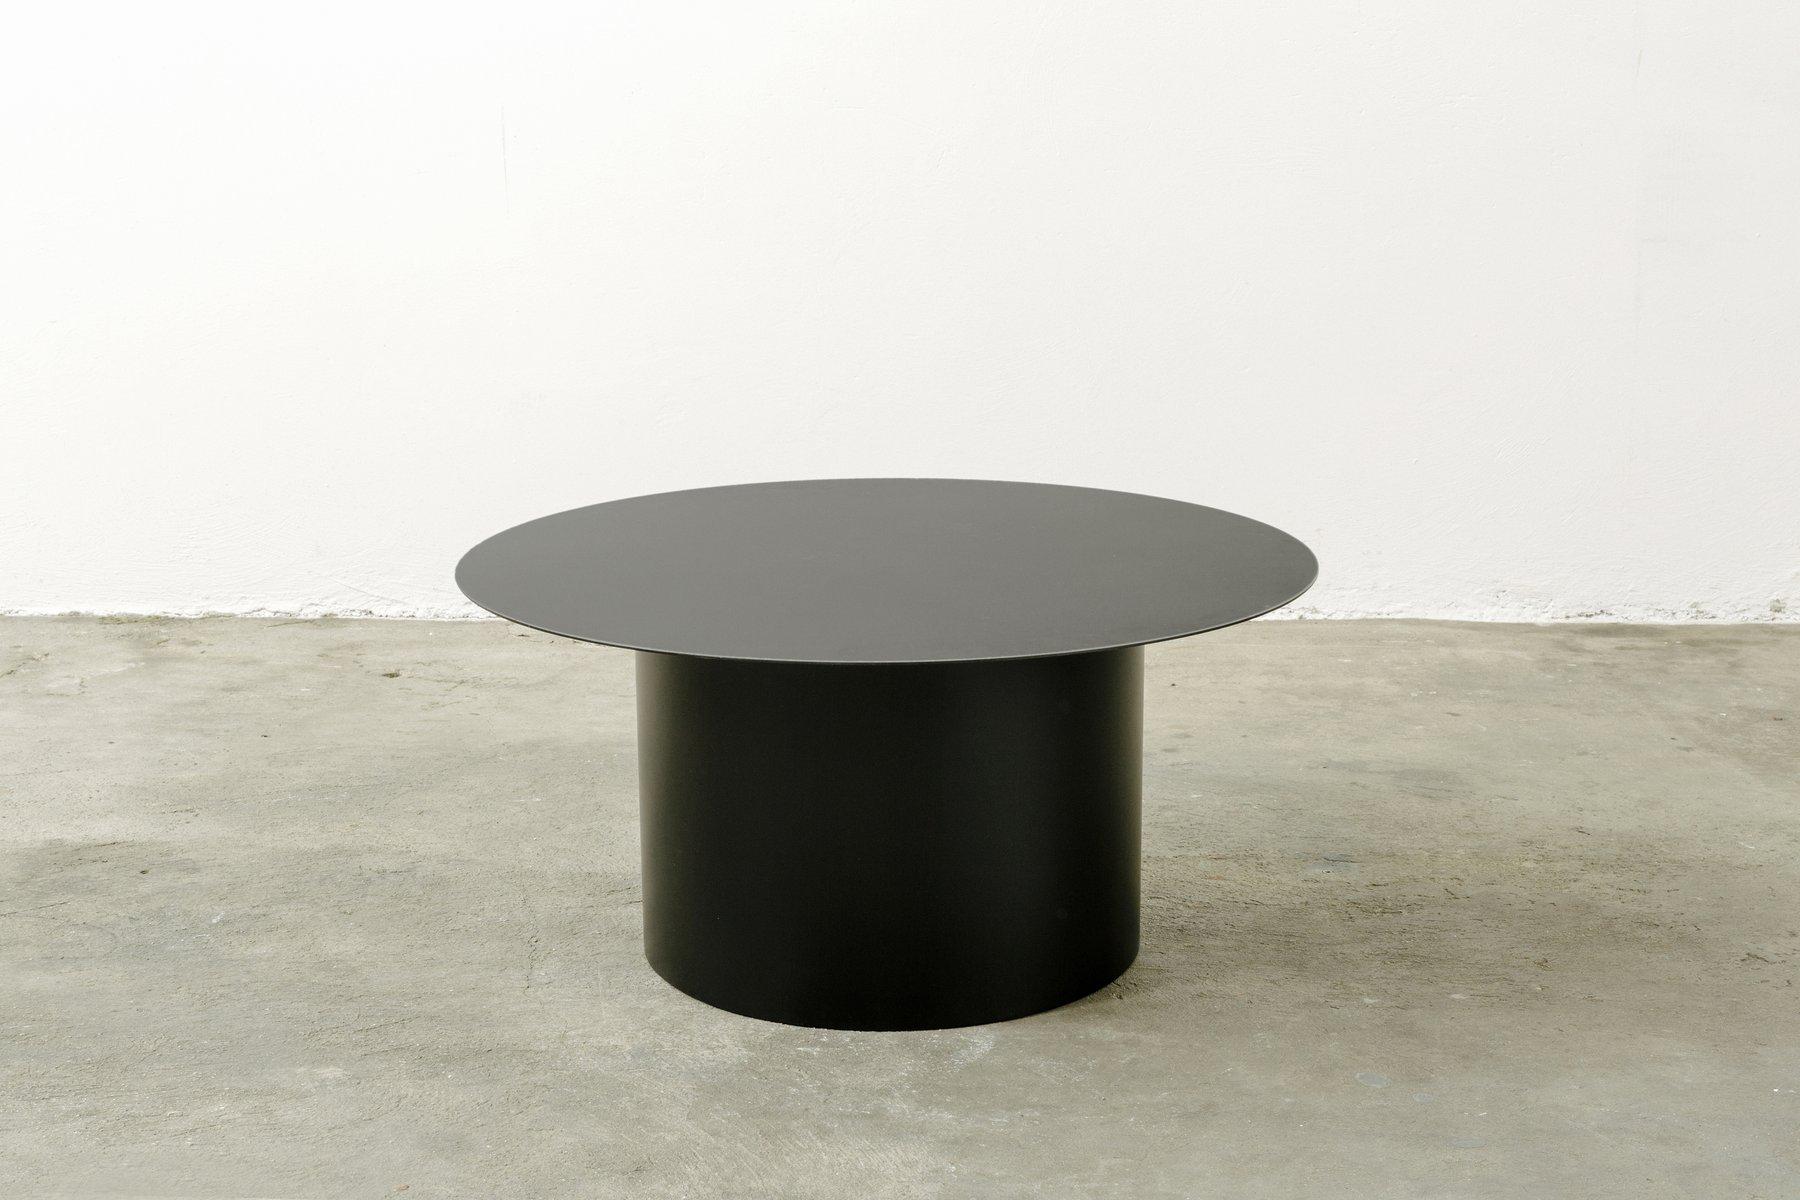 Chiodo NA6 Tisch von Design ? Studio Associato for Marco Ripa